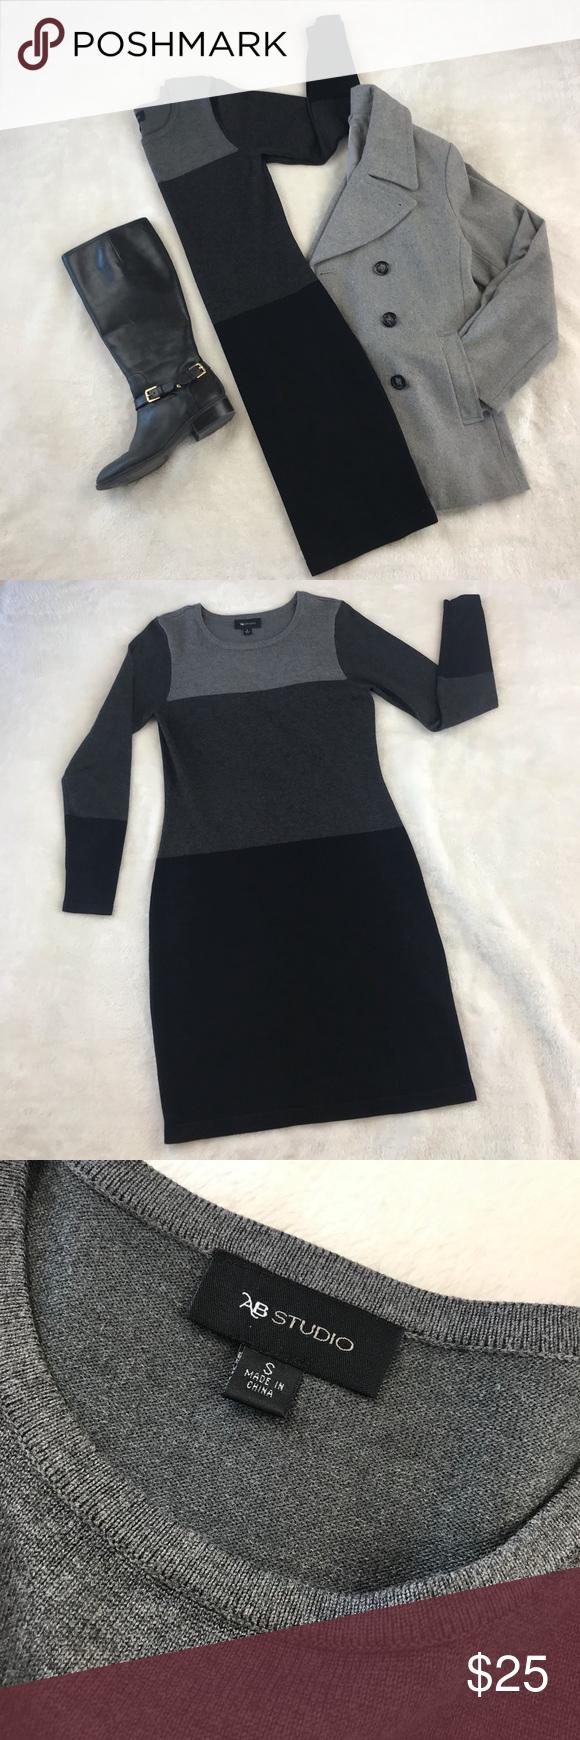 cfcad3b2bb7 Cozy Sweater Dress Women s sweater dress from Kohl s AB Studio Size Small  fits like a Size